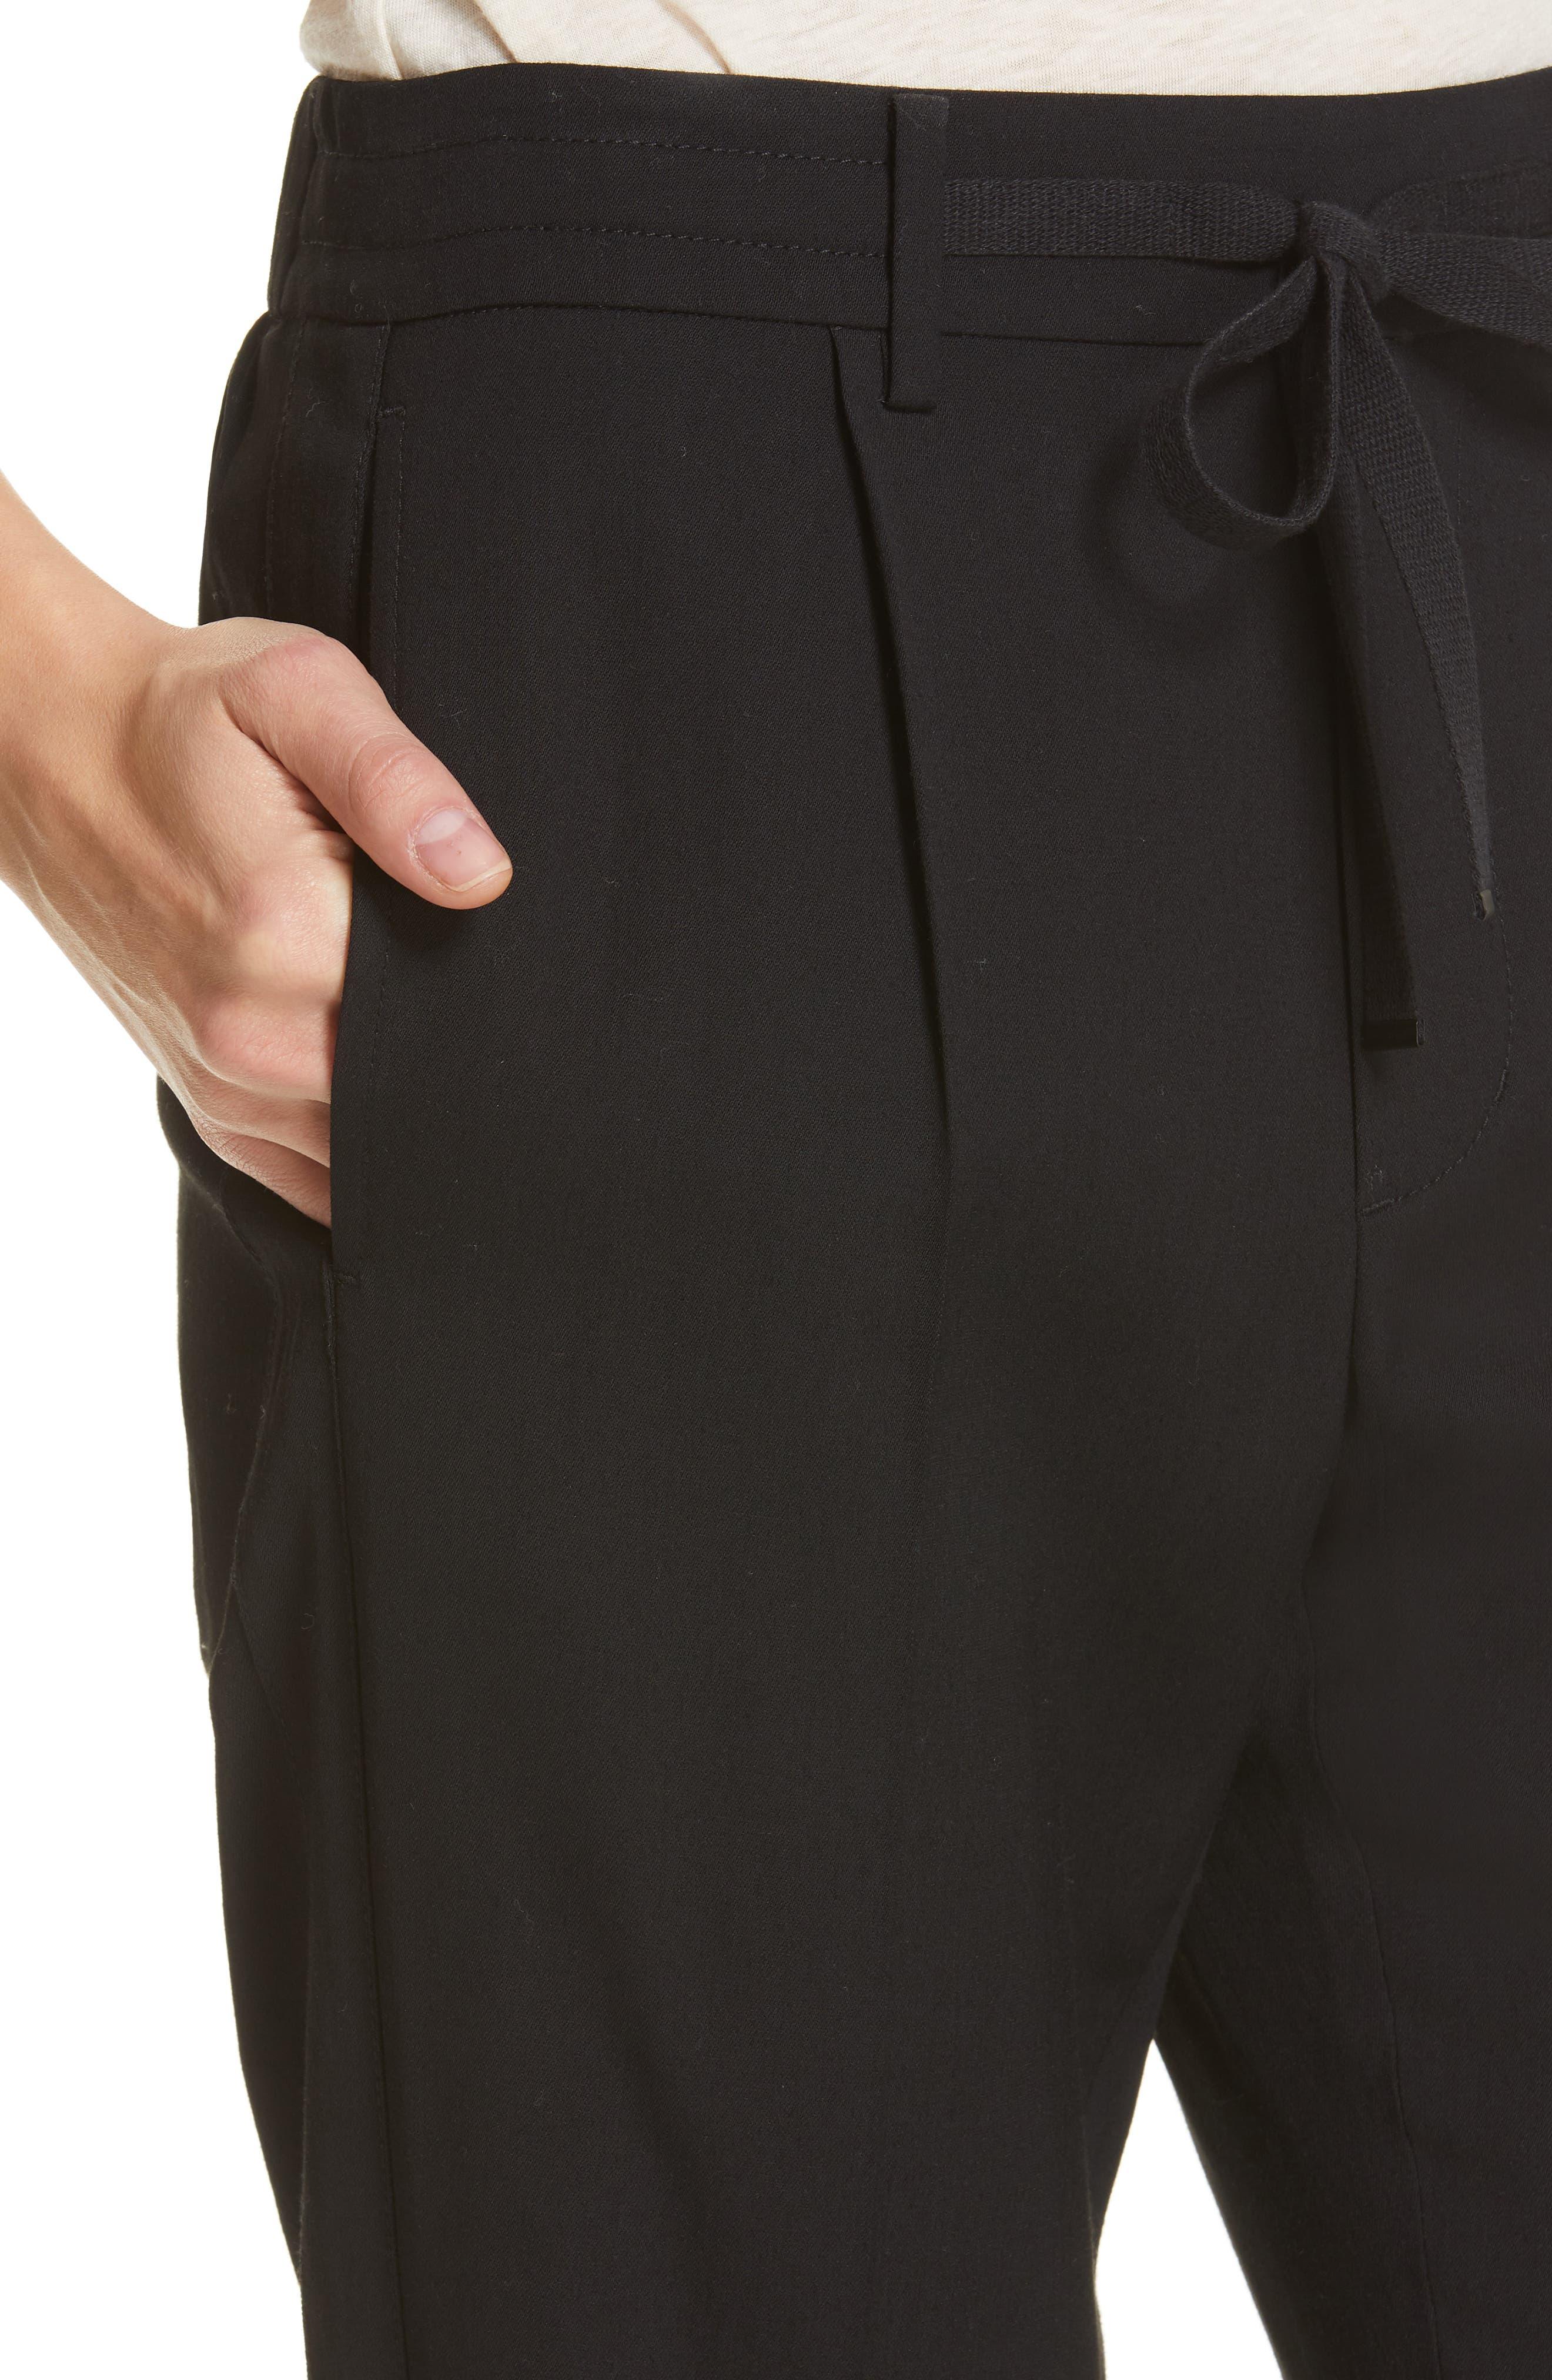 VINCE, Cuffed Jogger Pants, Alternate thumbnail 5, color, BLACK